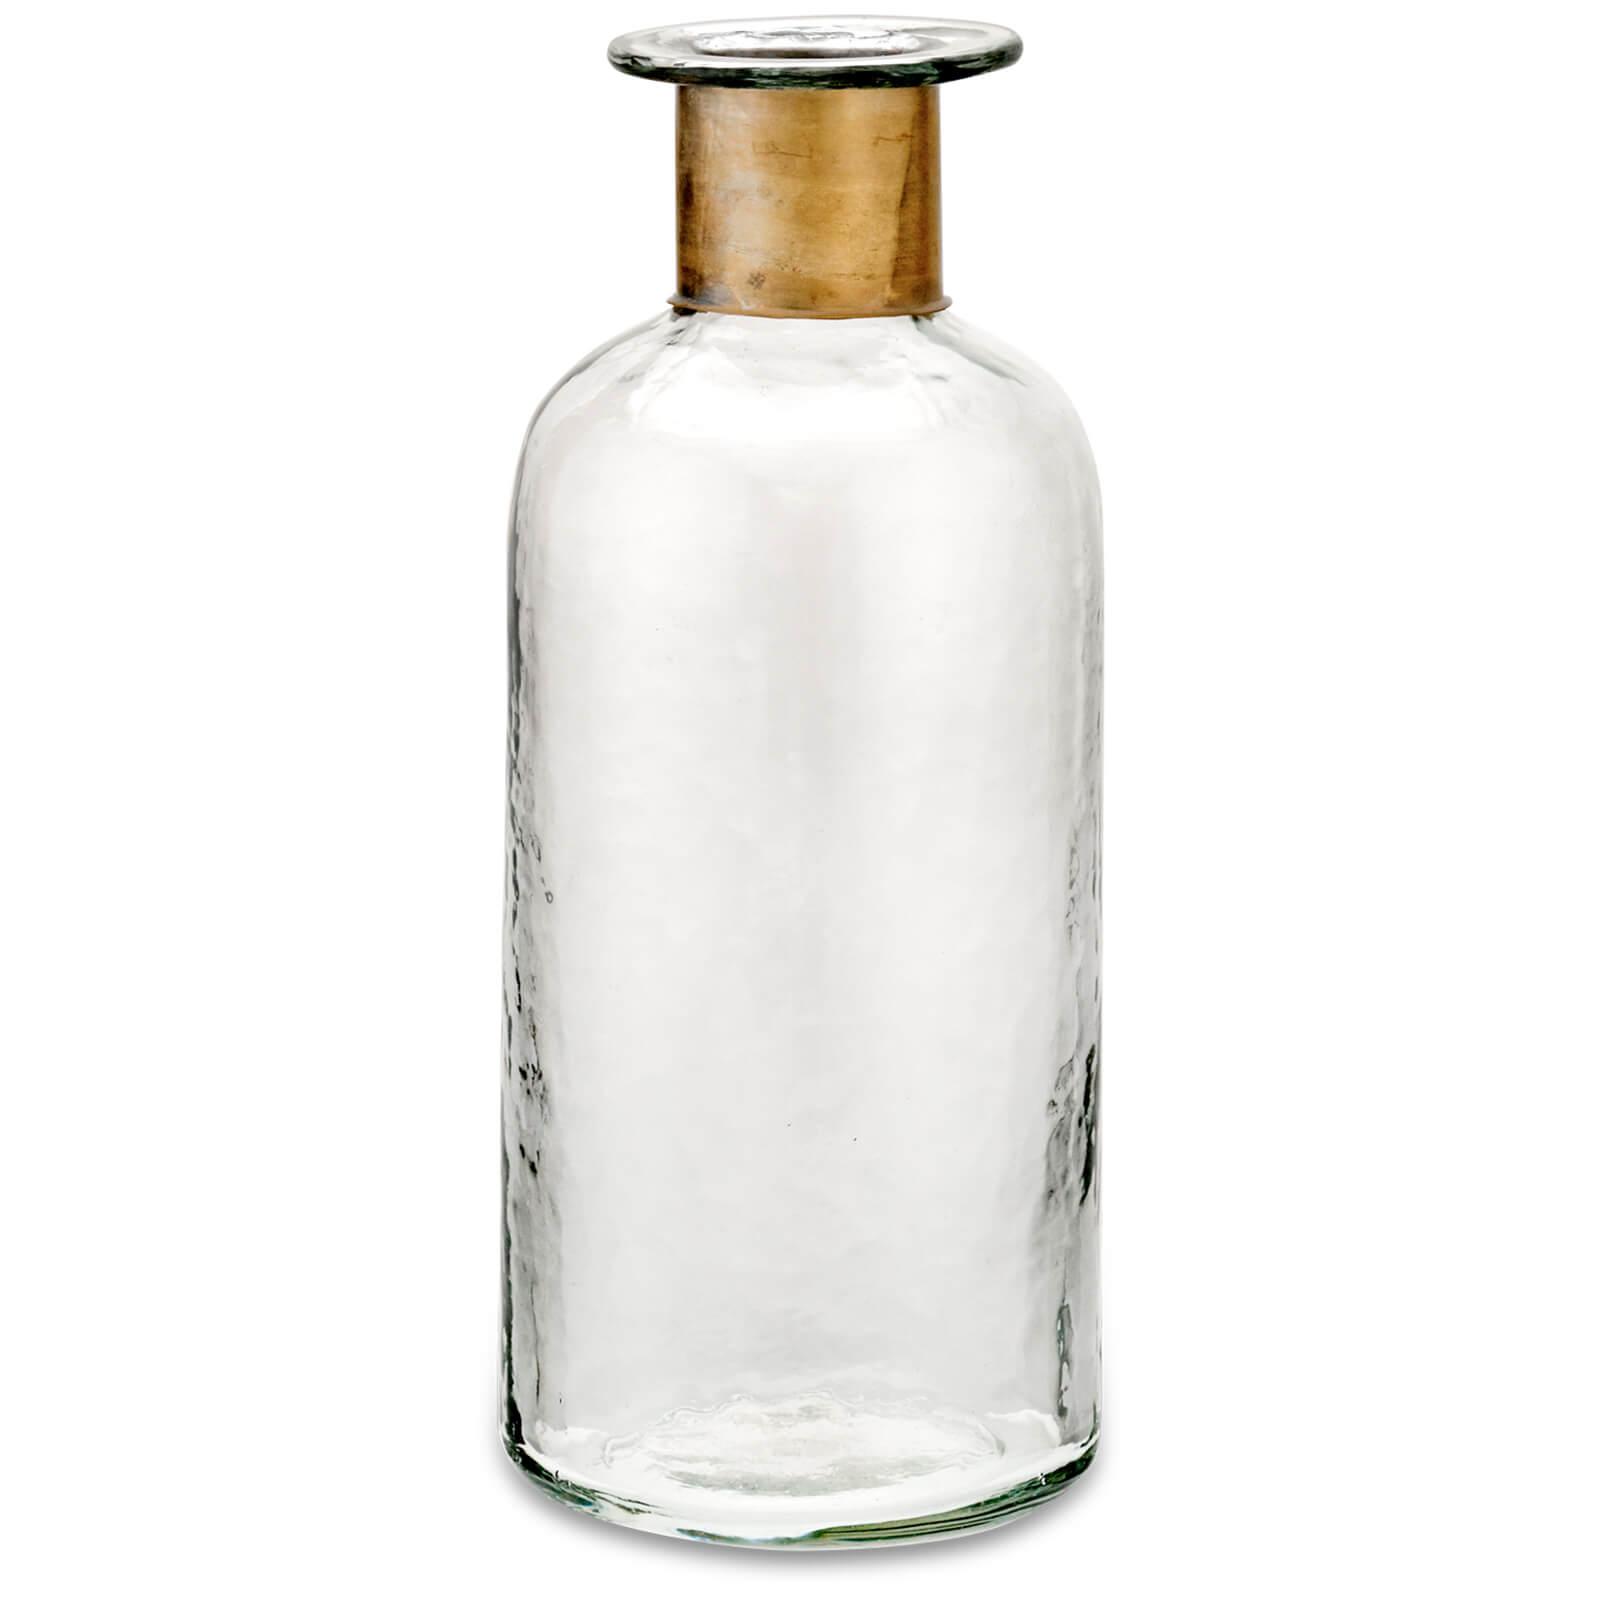 Nkuku Chara Hammered Bottle - Clear Glass & Antique Brass - 31.5cm